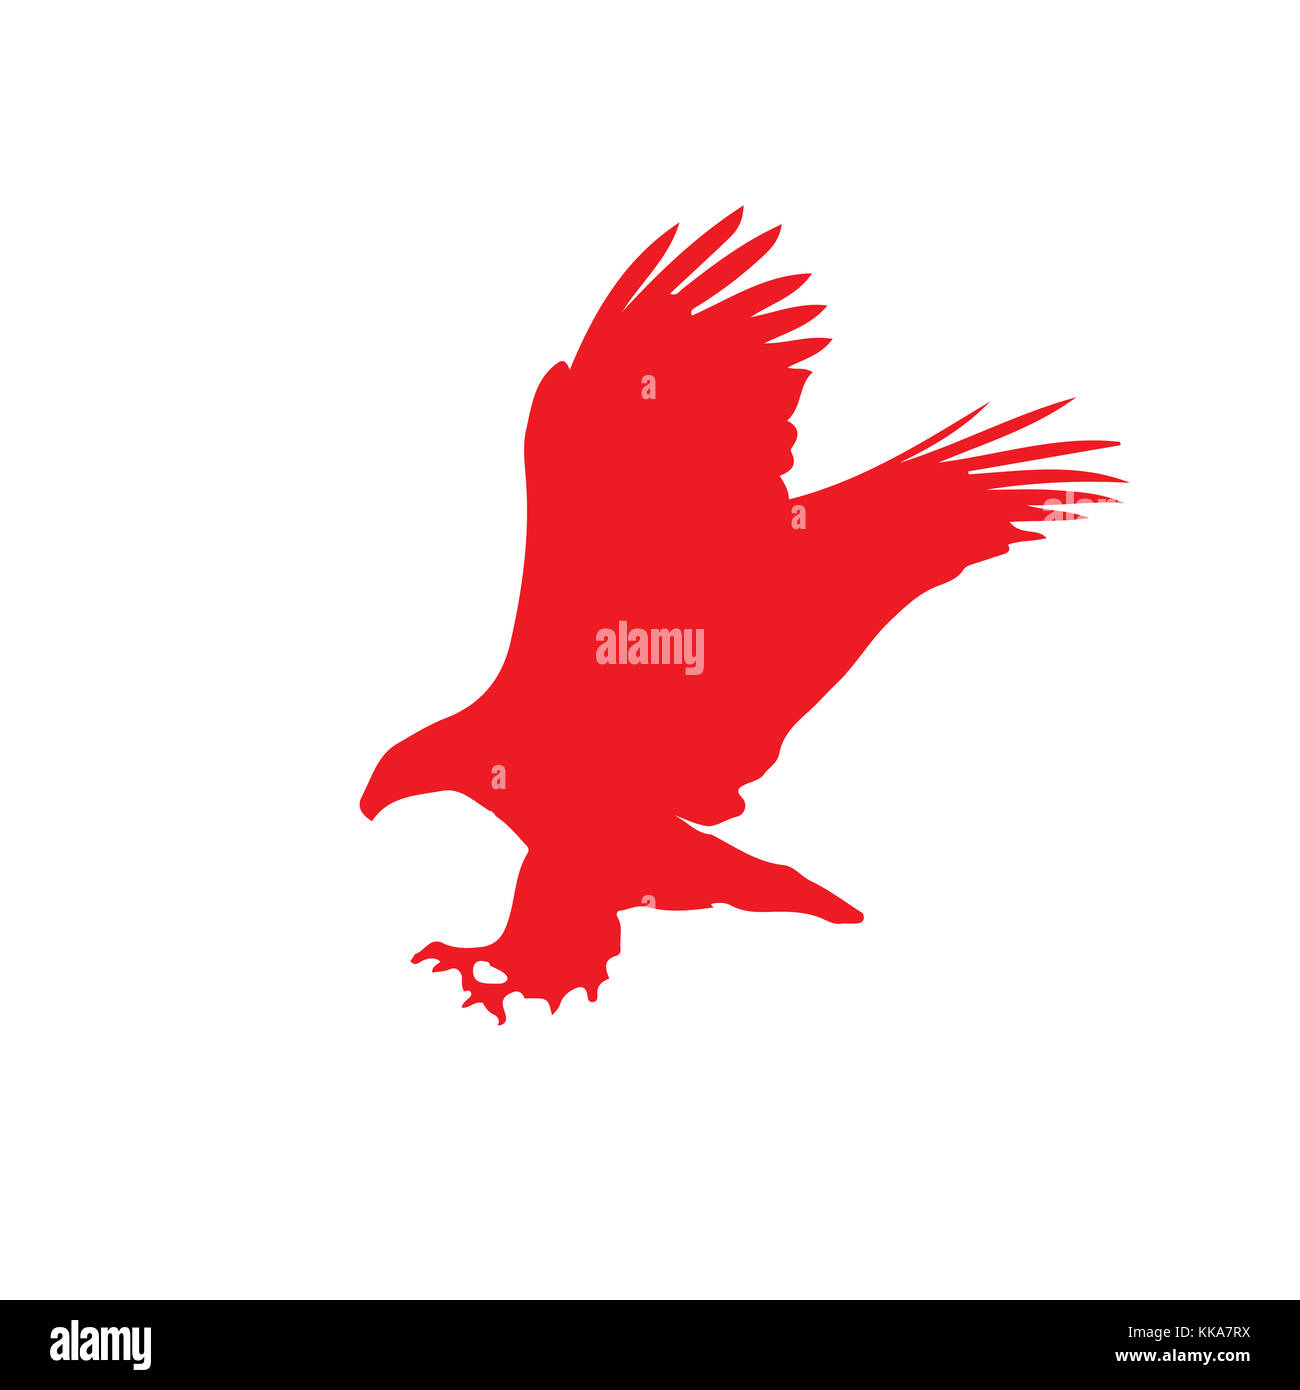 Illustration Of Eagle Flying Stock Photos & Illustration Of Eagle ...